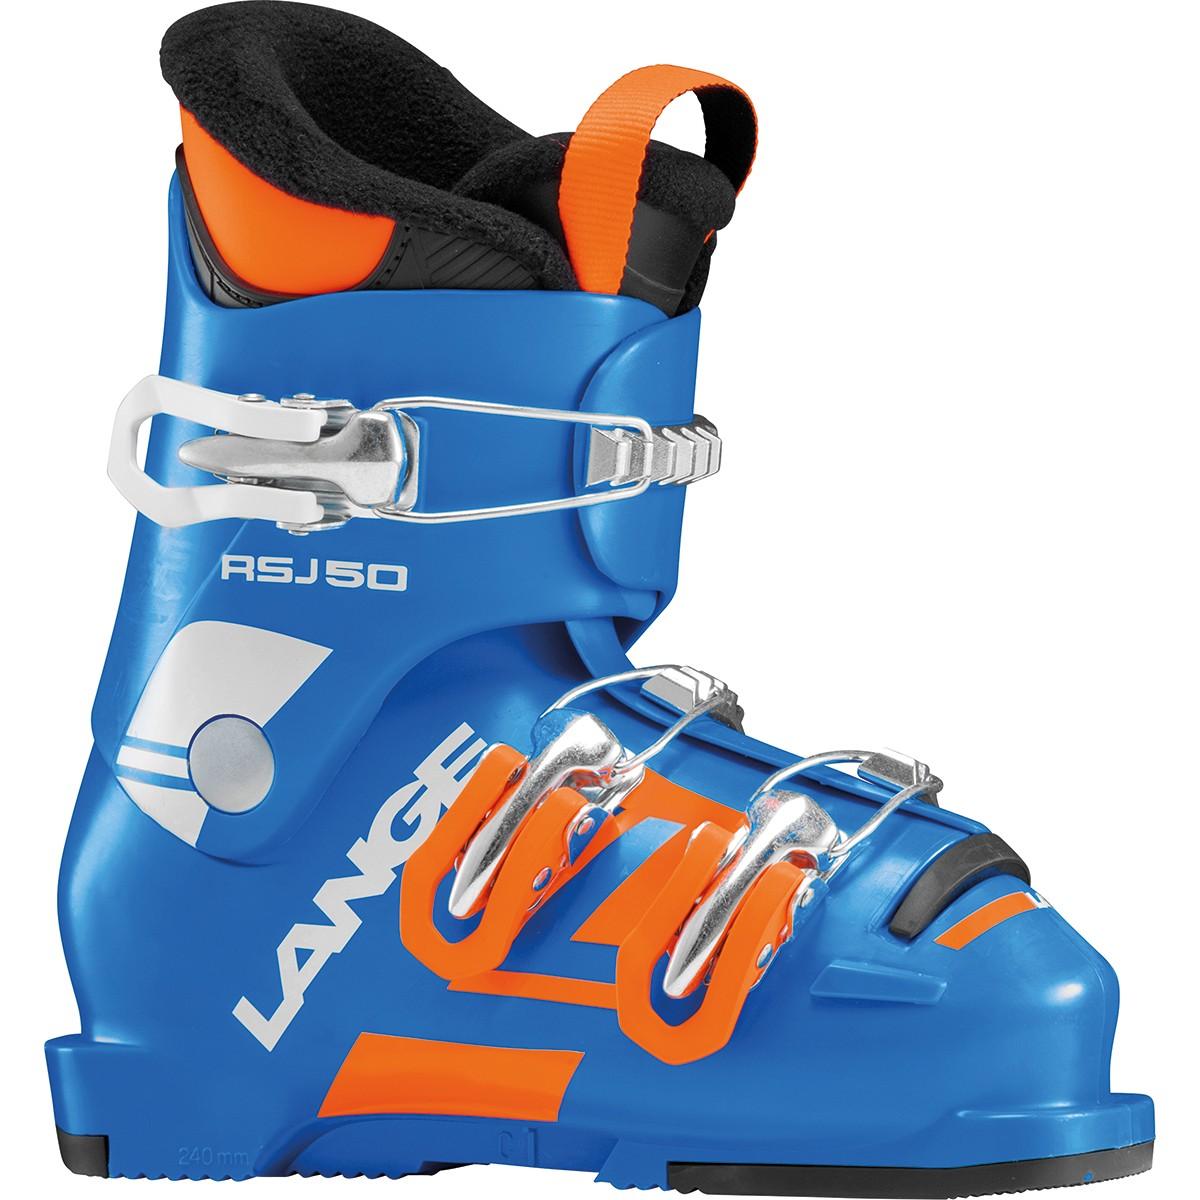 Scarponi sci Lange Rsj 50 (Colore: blu-arancio, Taglia: 18)